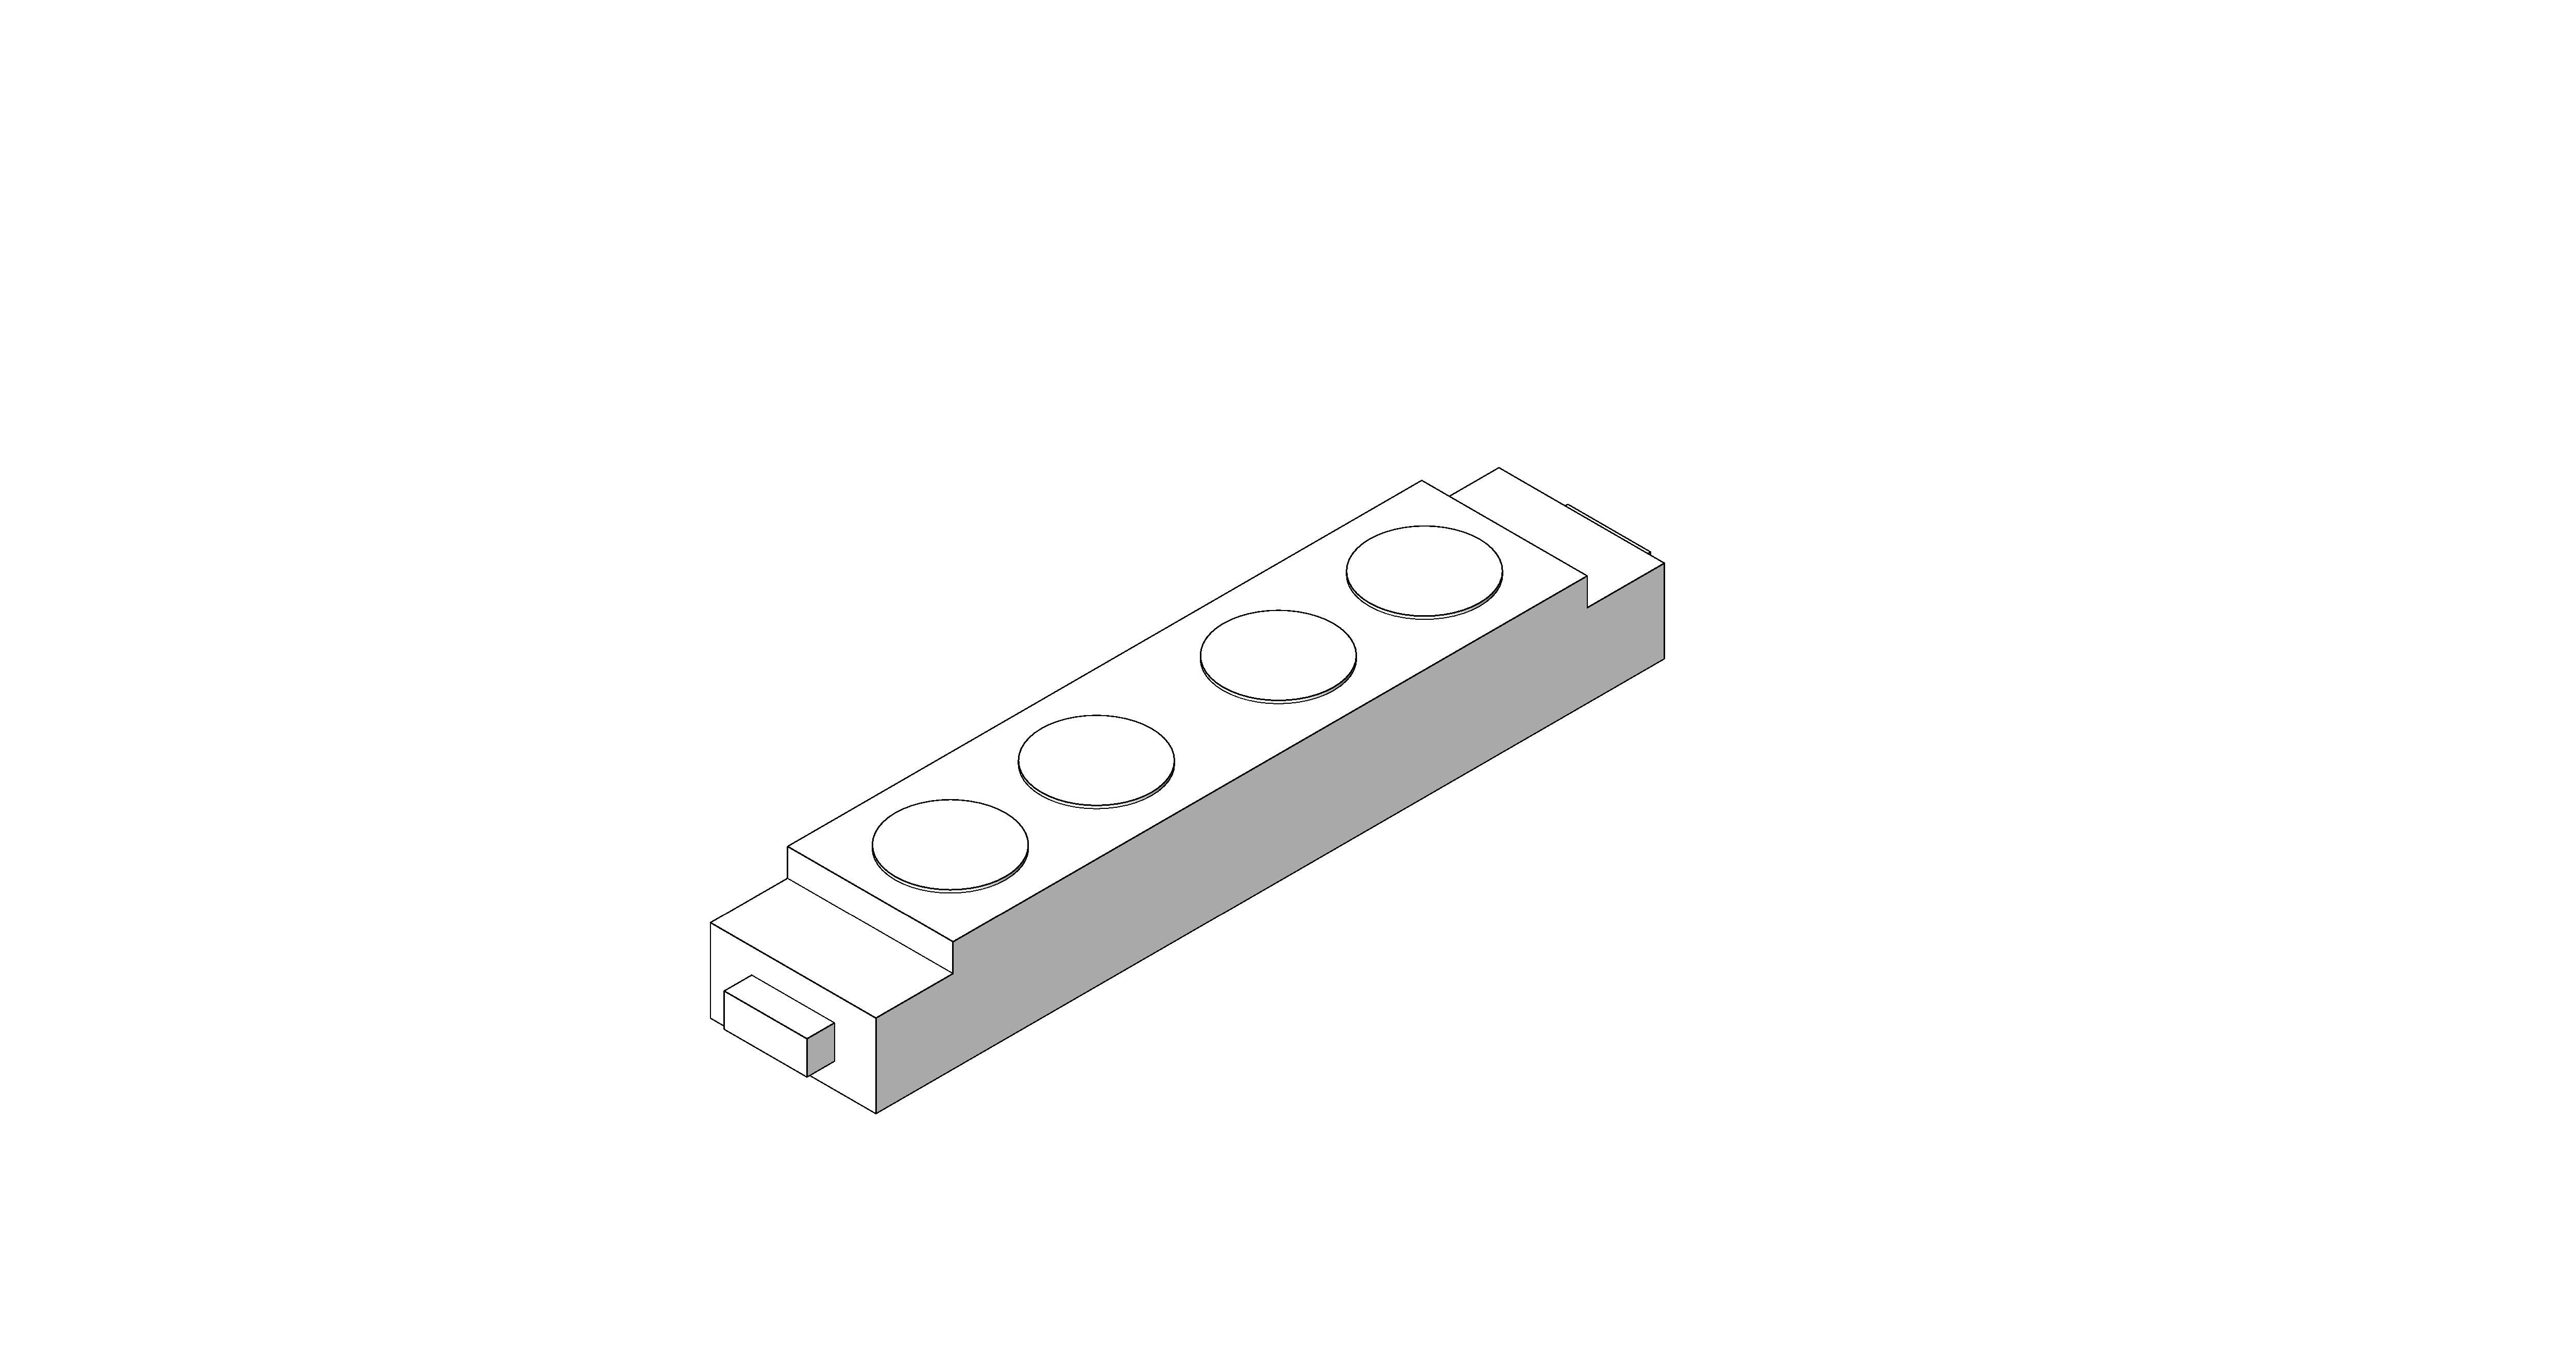 Product: Desk Module - 2 Gang - Power Data